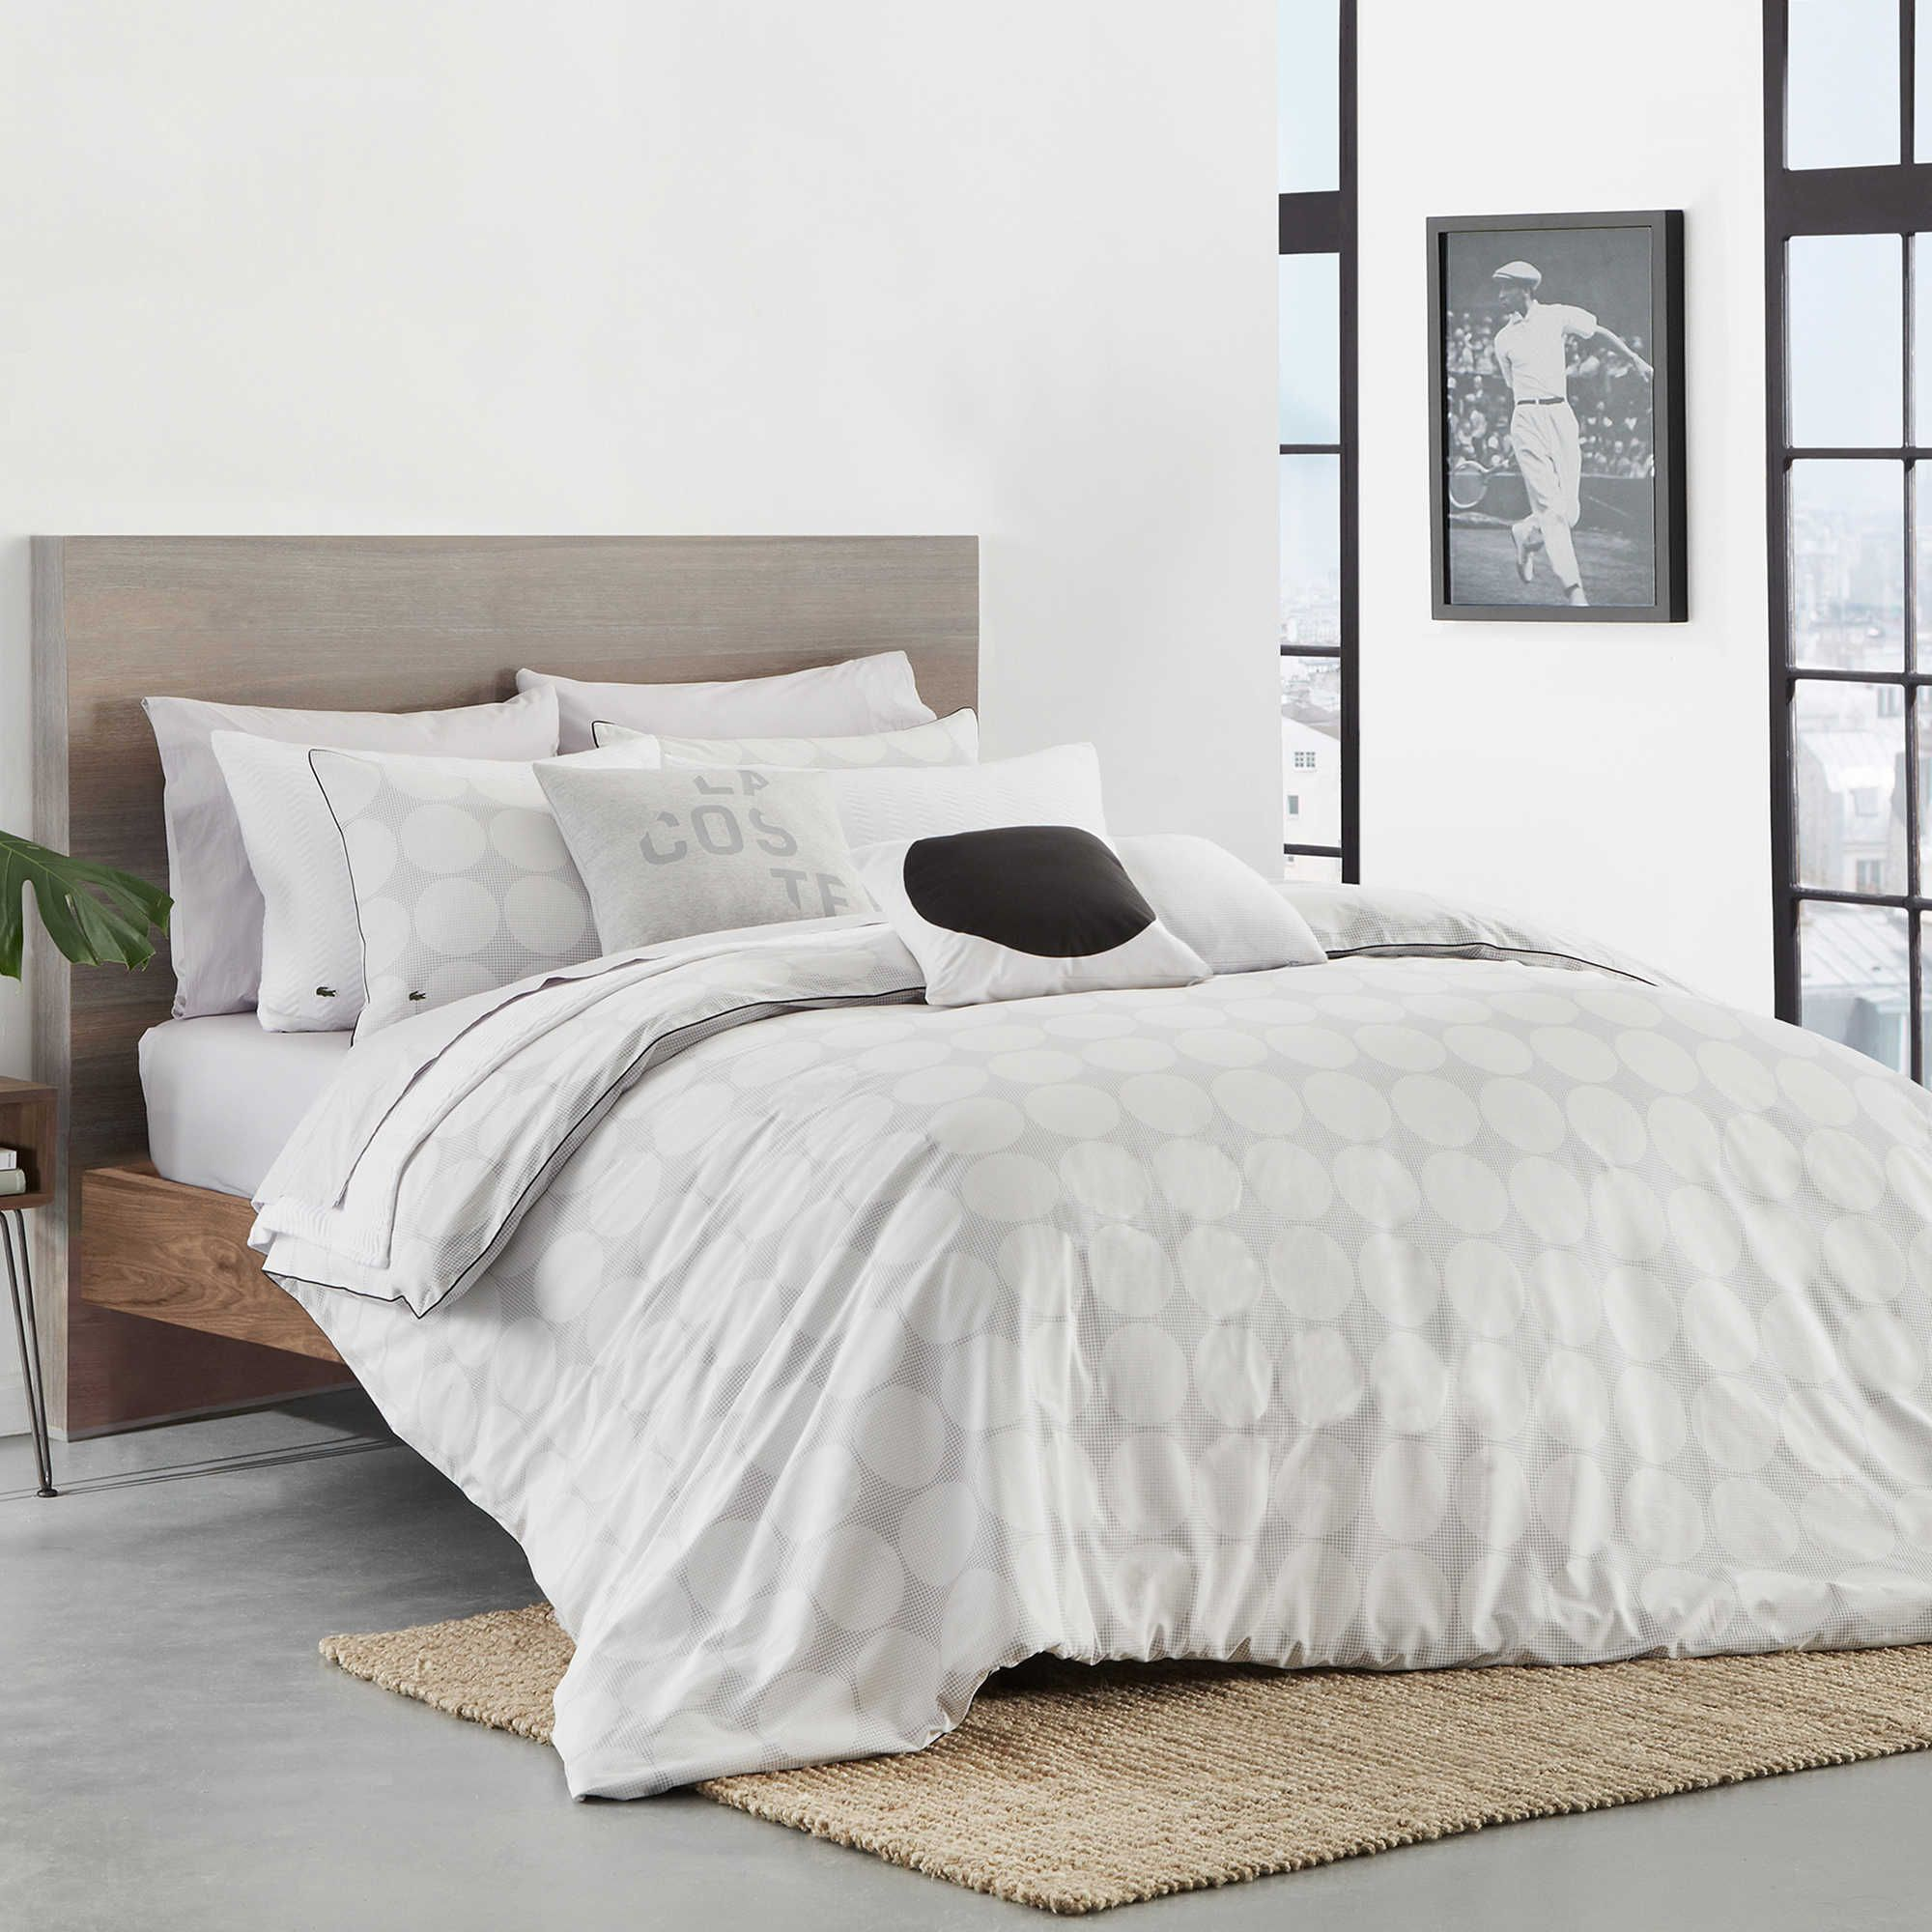 pillowcase vo percale and duvet vostok cover en southern cotton lacoste